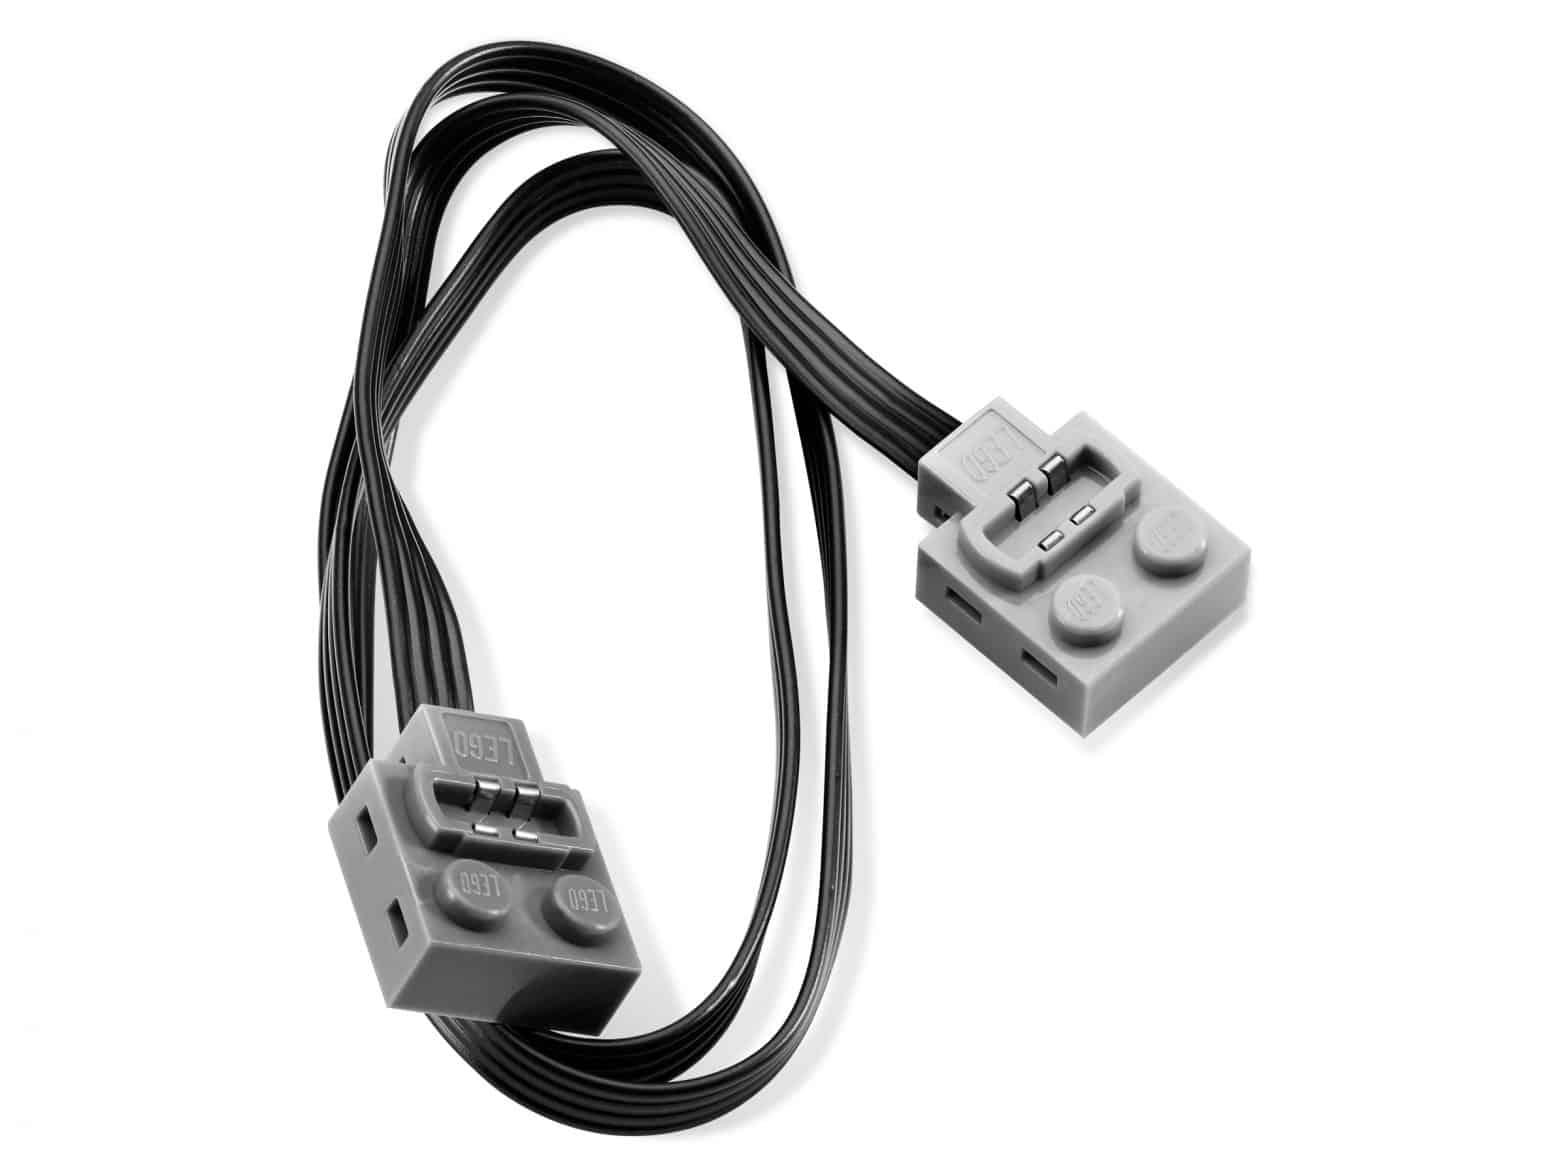 lego 8871 power functions przewod 50 cm